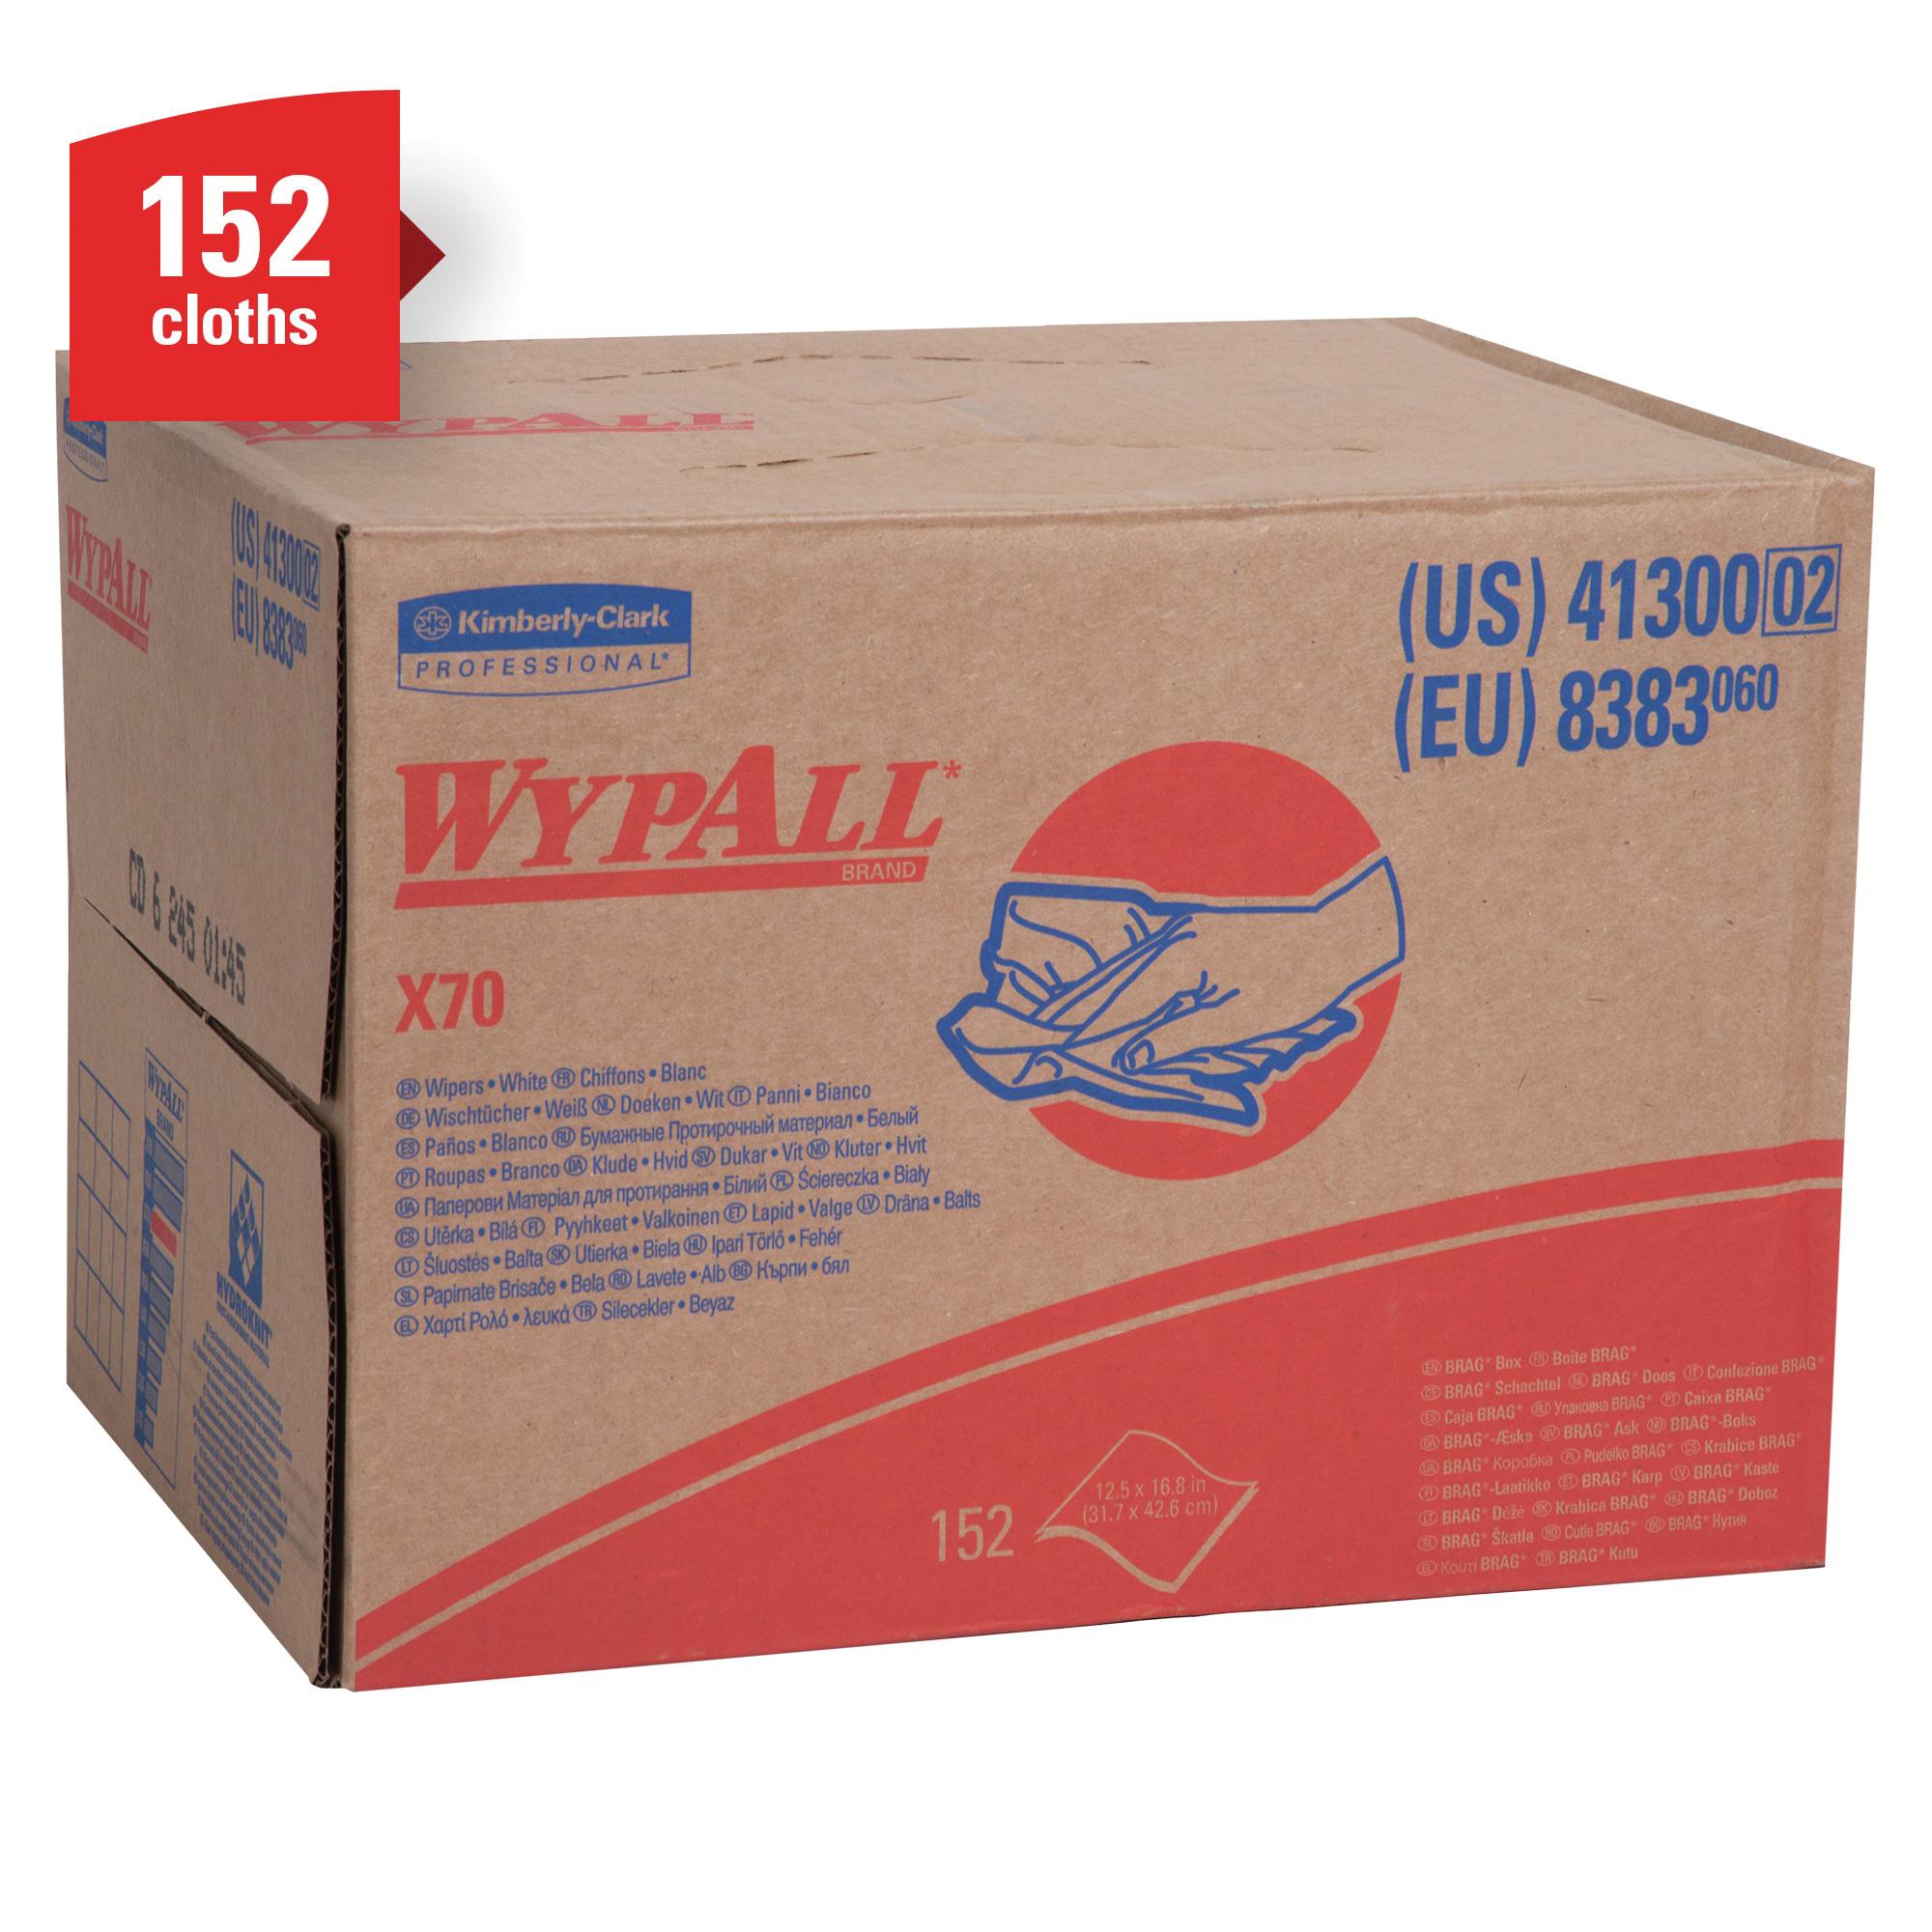 WypAll* 34790 X60 High Tech Disposable Wiper, Hydroknit*, White